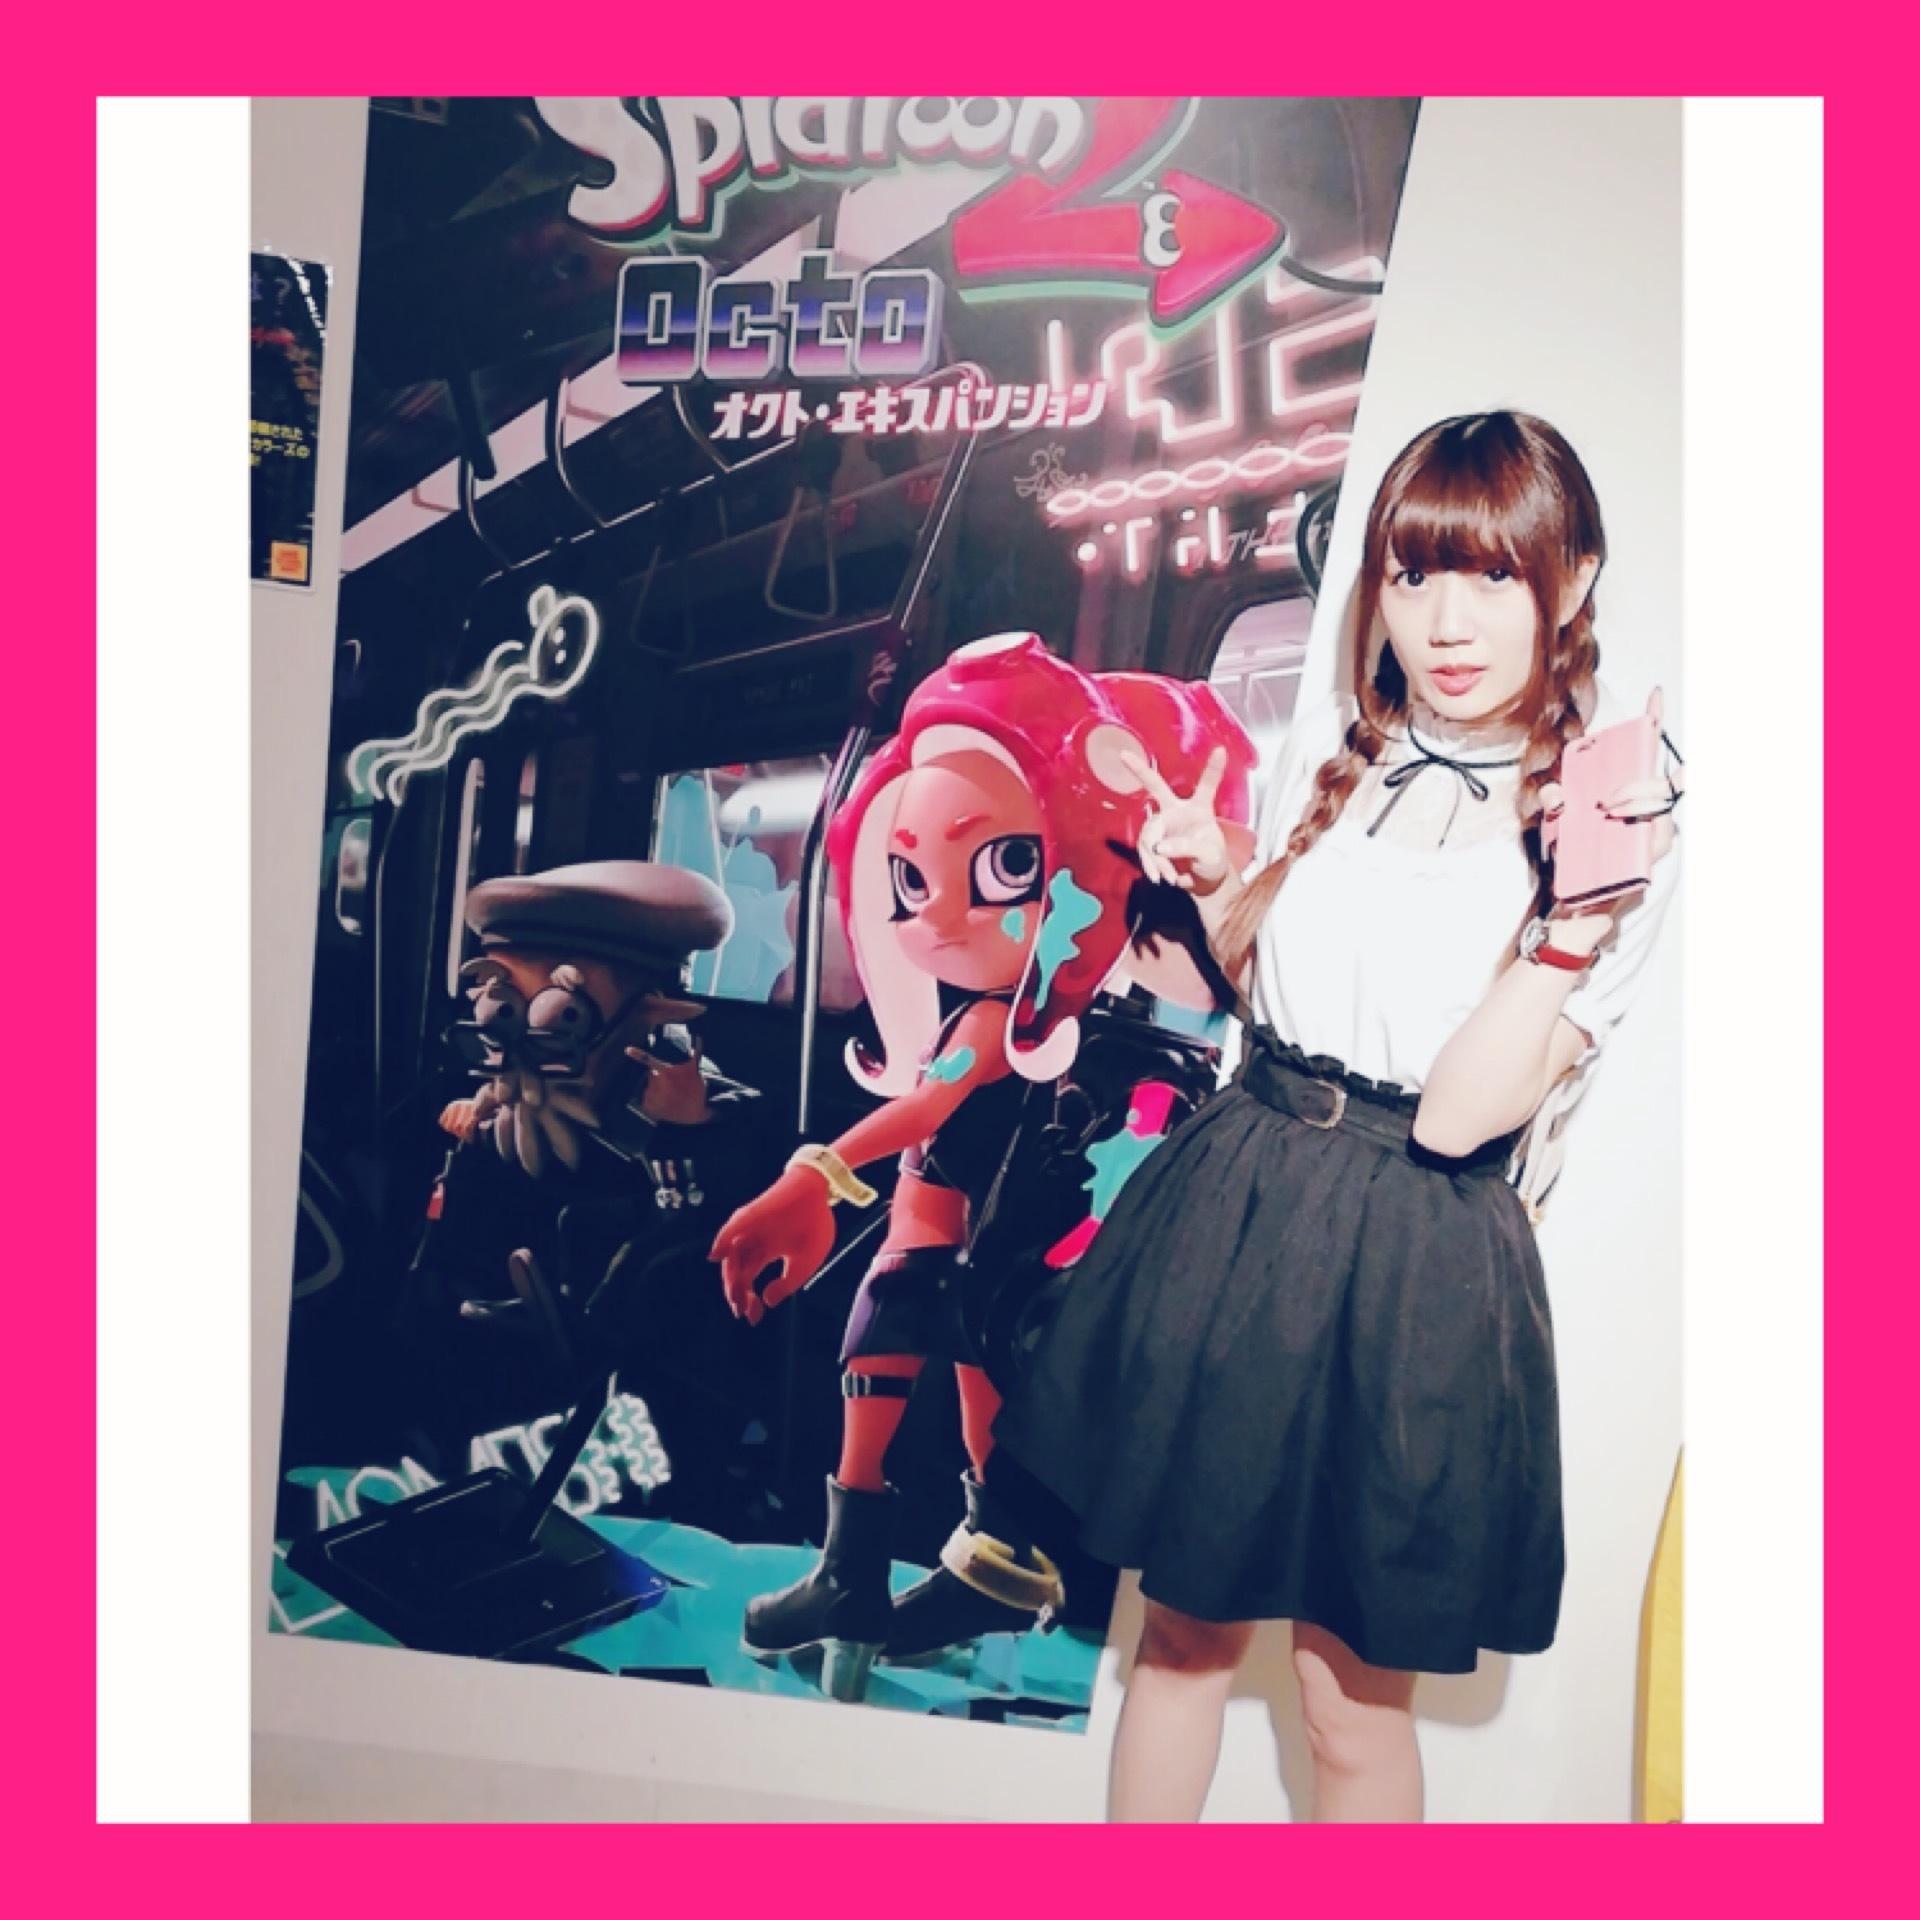 【Splatoon展】Shibuyaタワレコに行ってきました♡_1_2-1